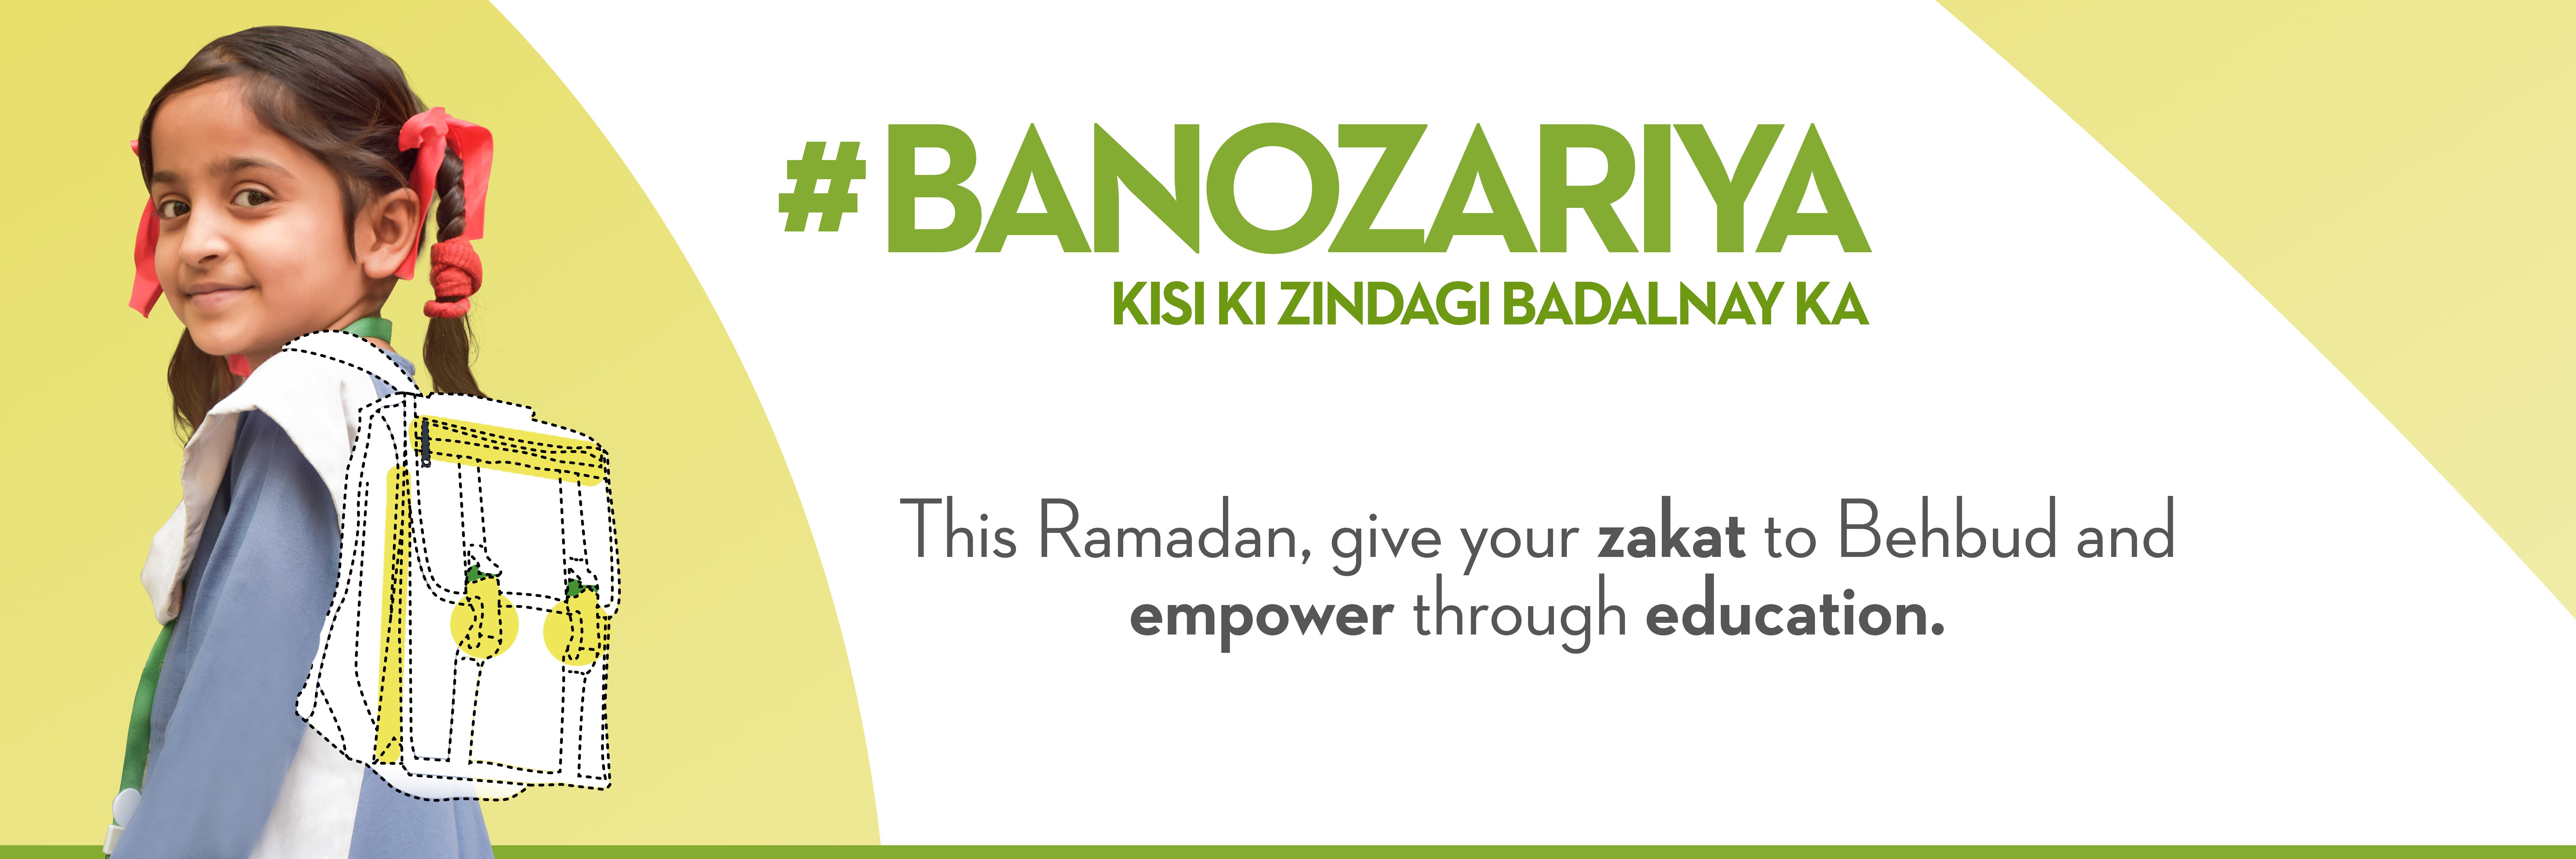 banozariya-ramadan-banner-new-1